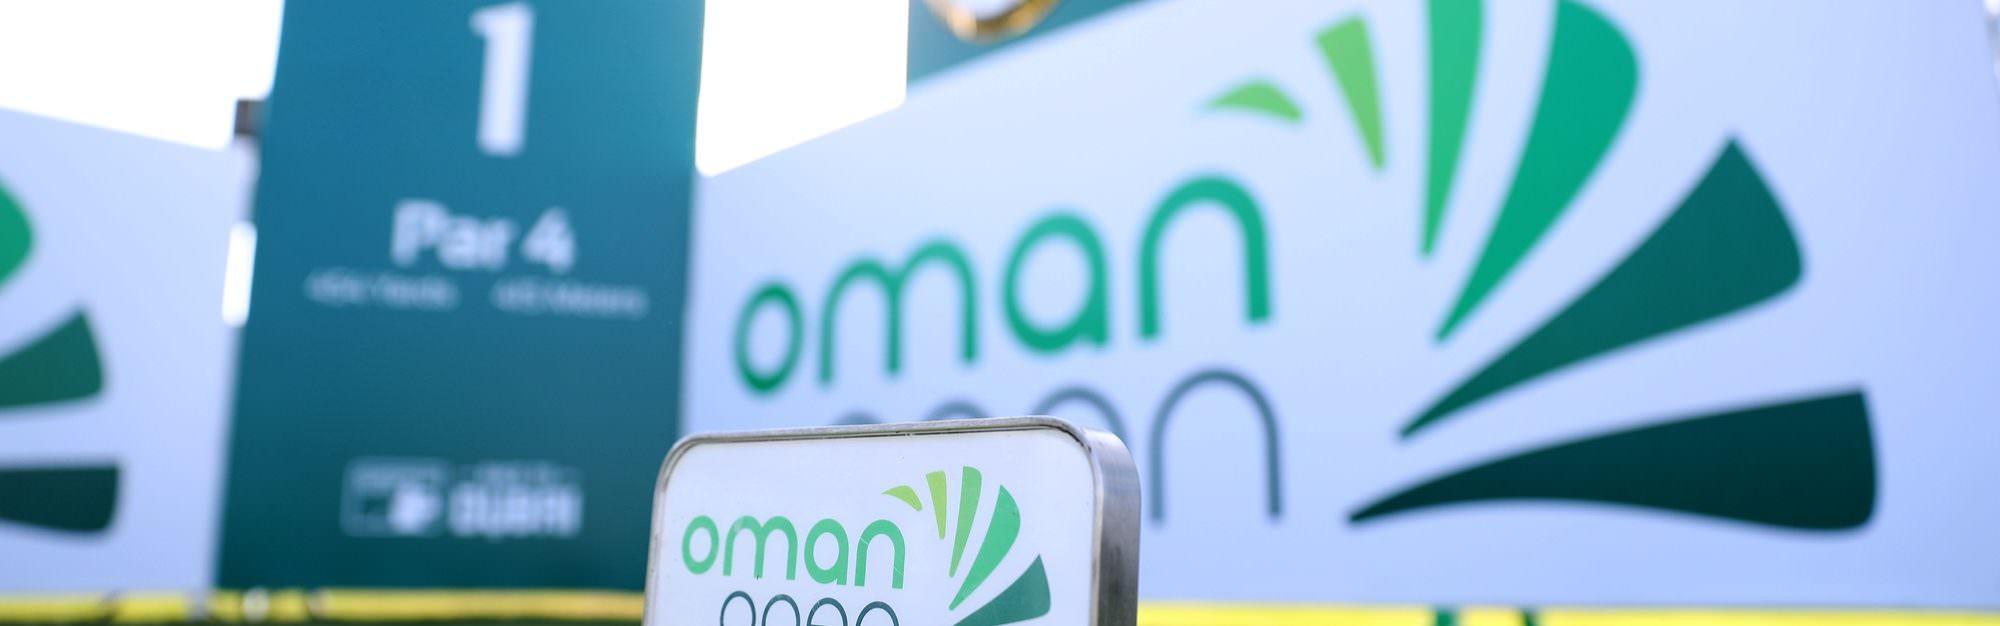 Oman Open prize money